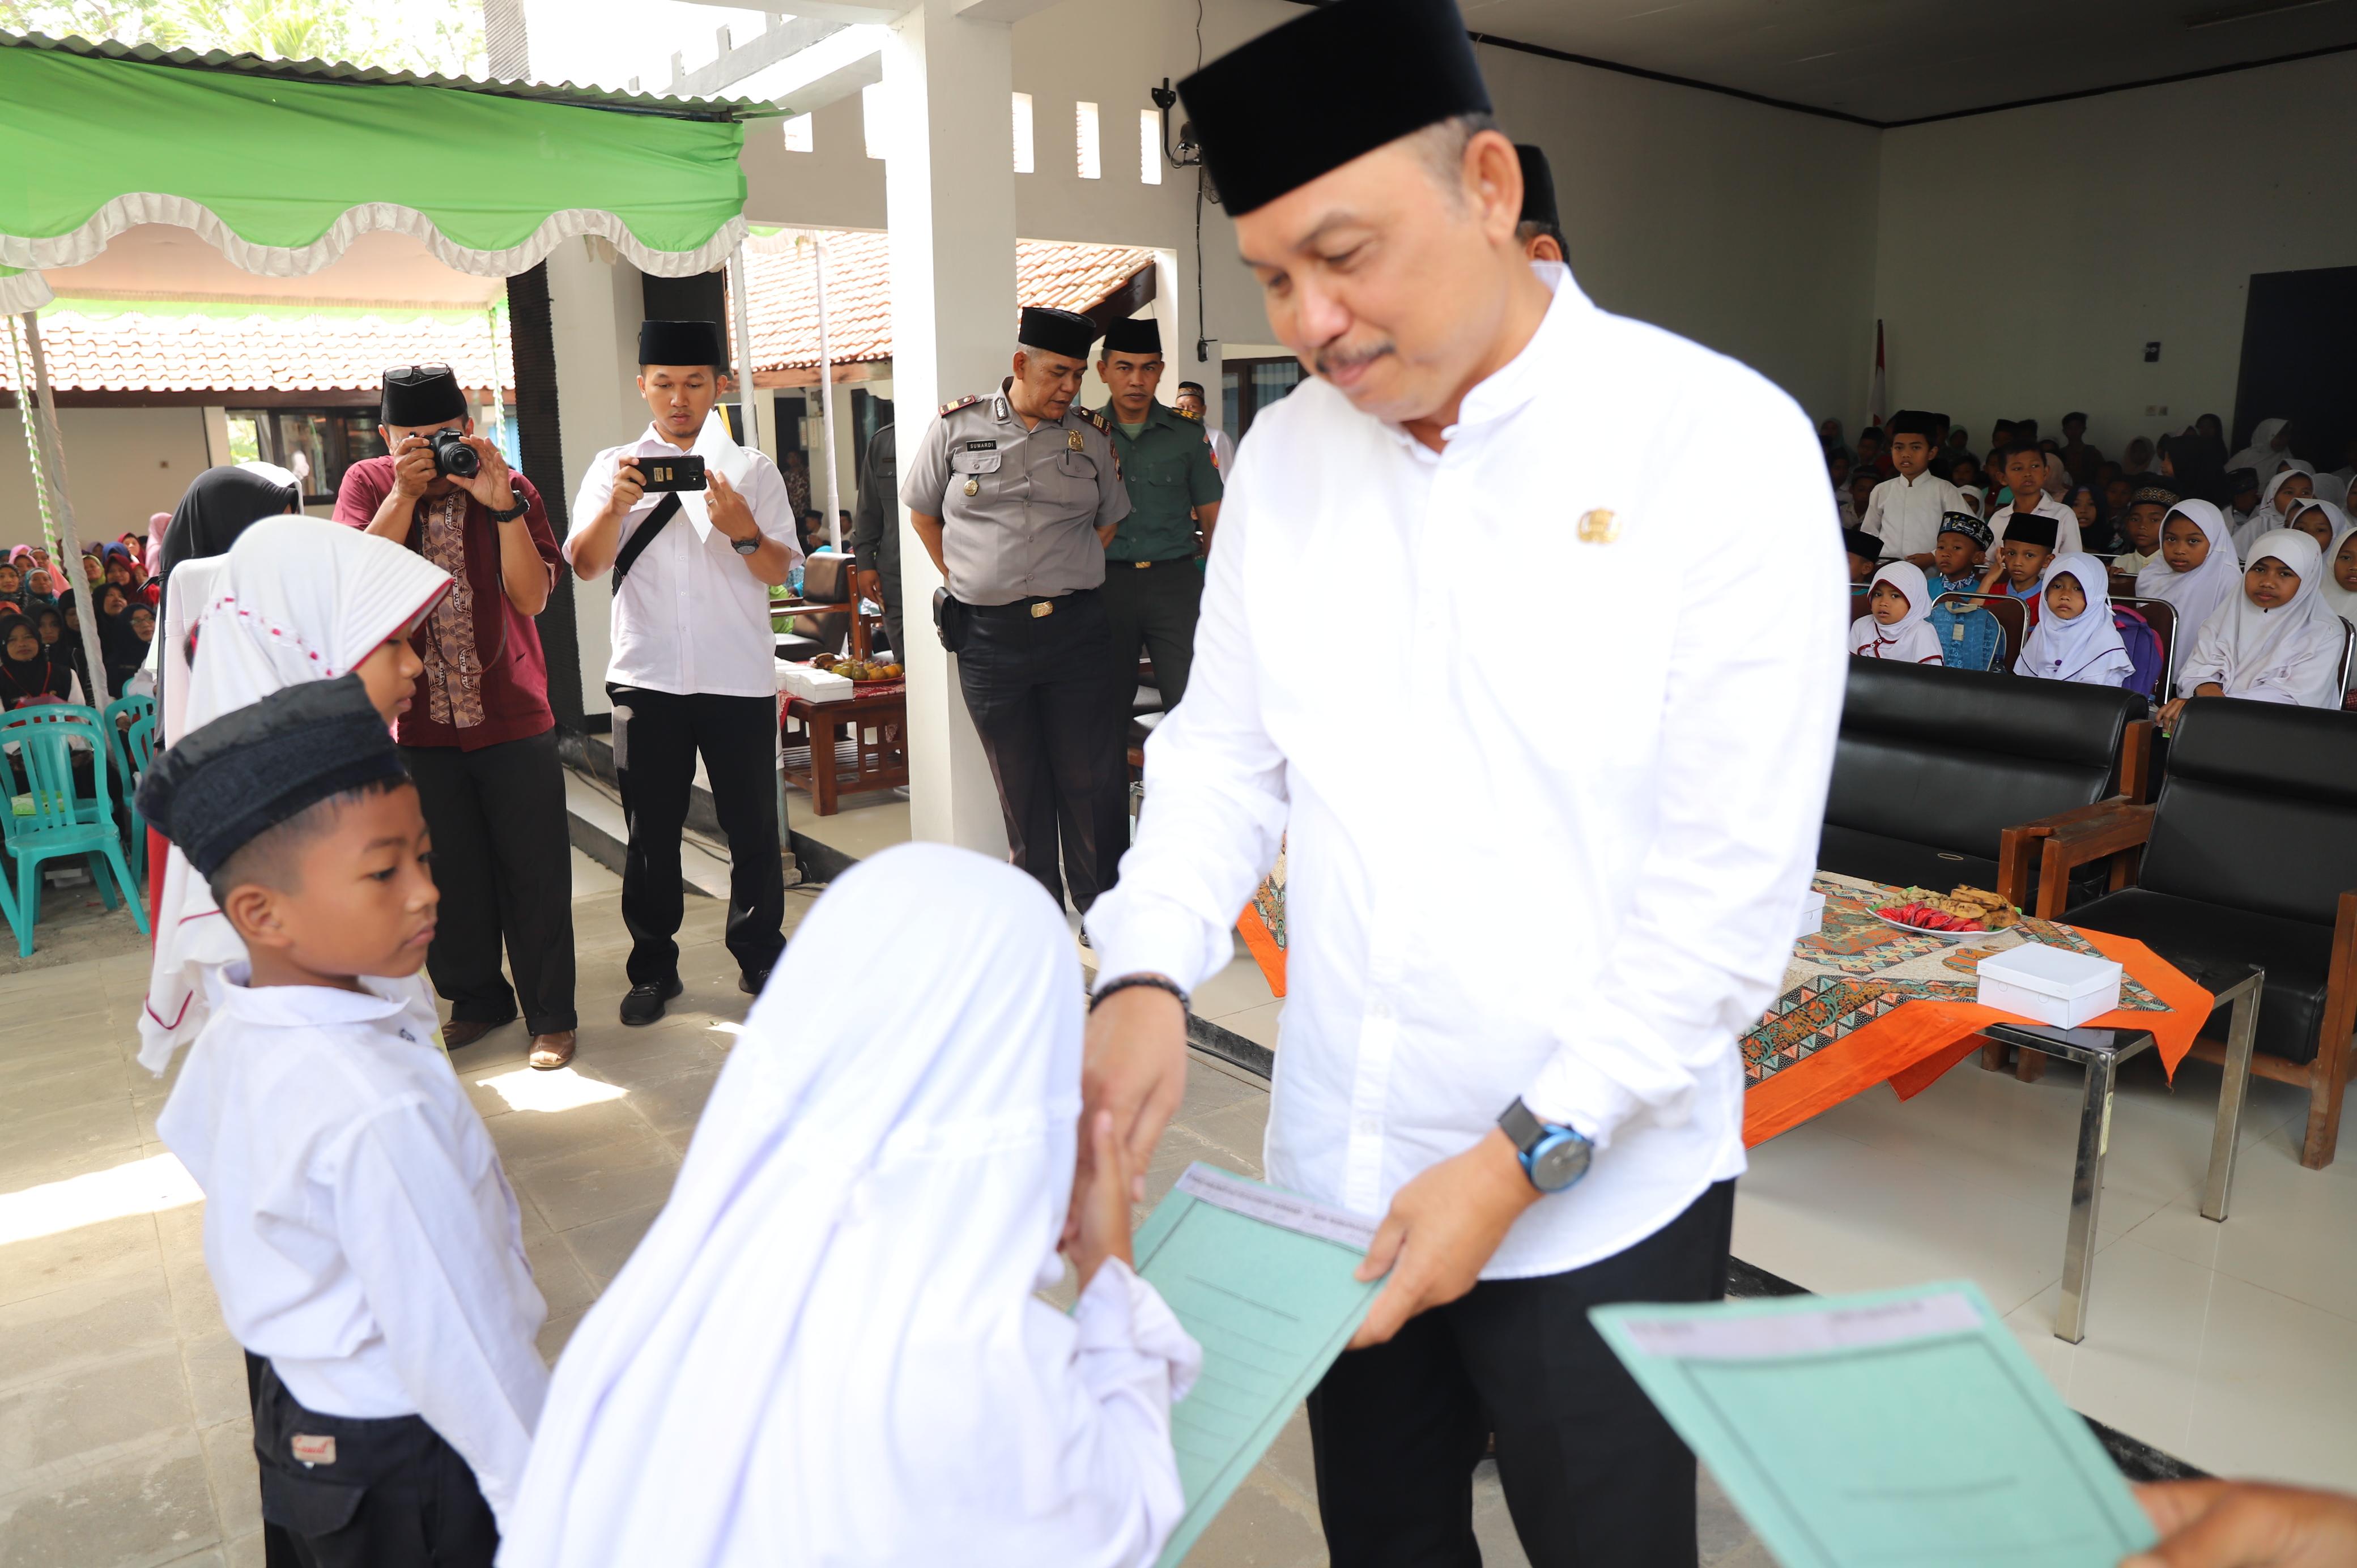 Peringati Tahun Baru Islam, Kecamatan Butuh Gelar Pengajian dan Beri Santunan Kepada Anak Yatim